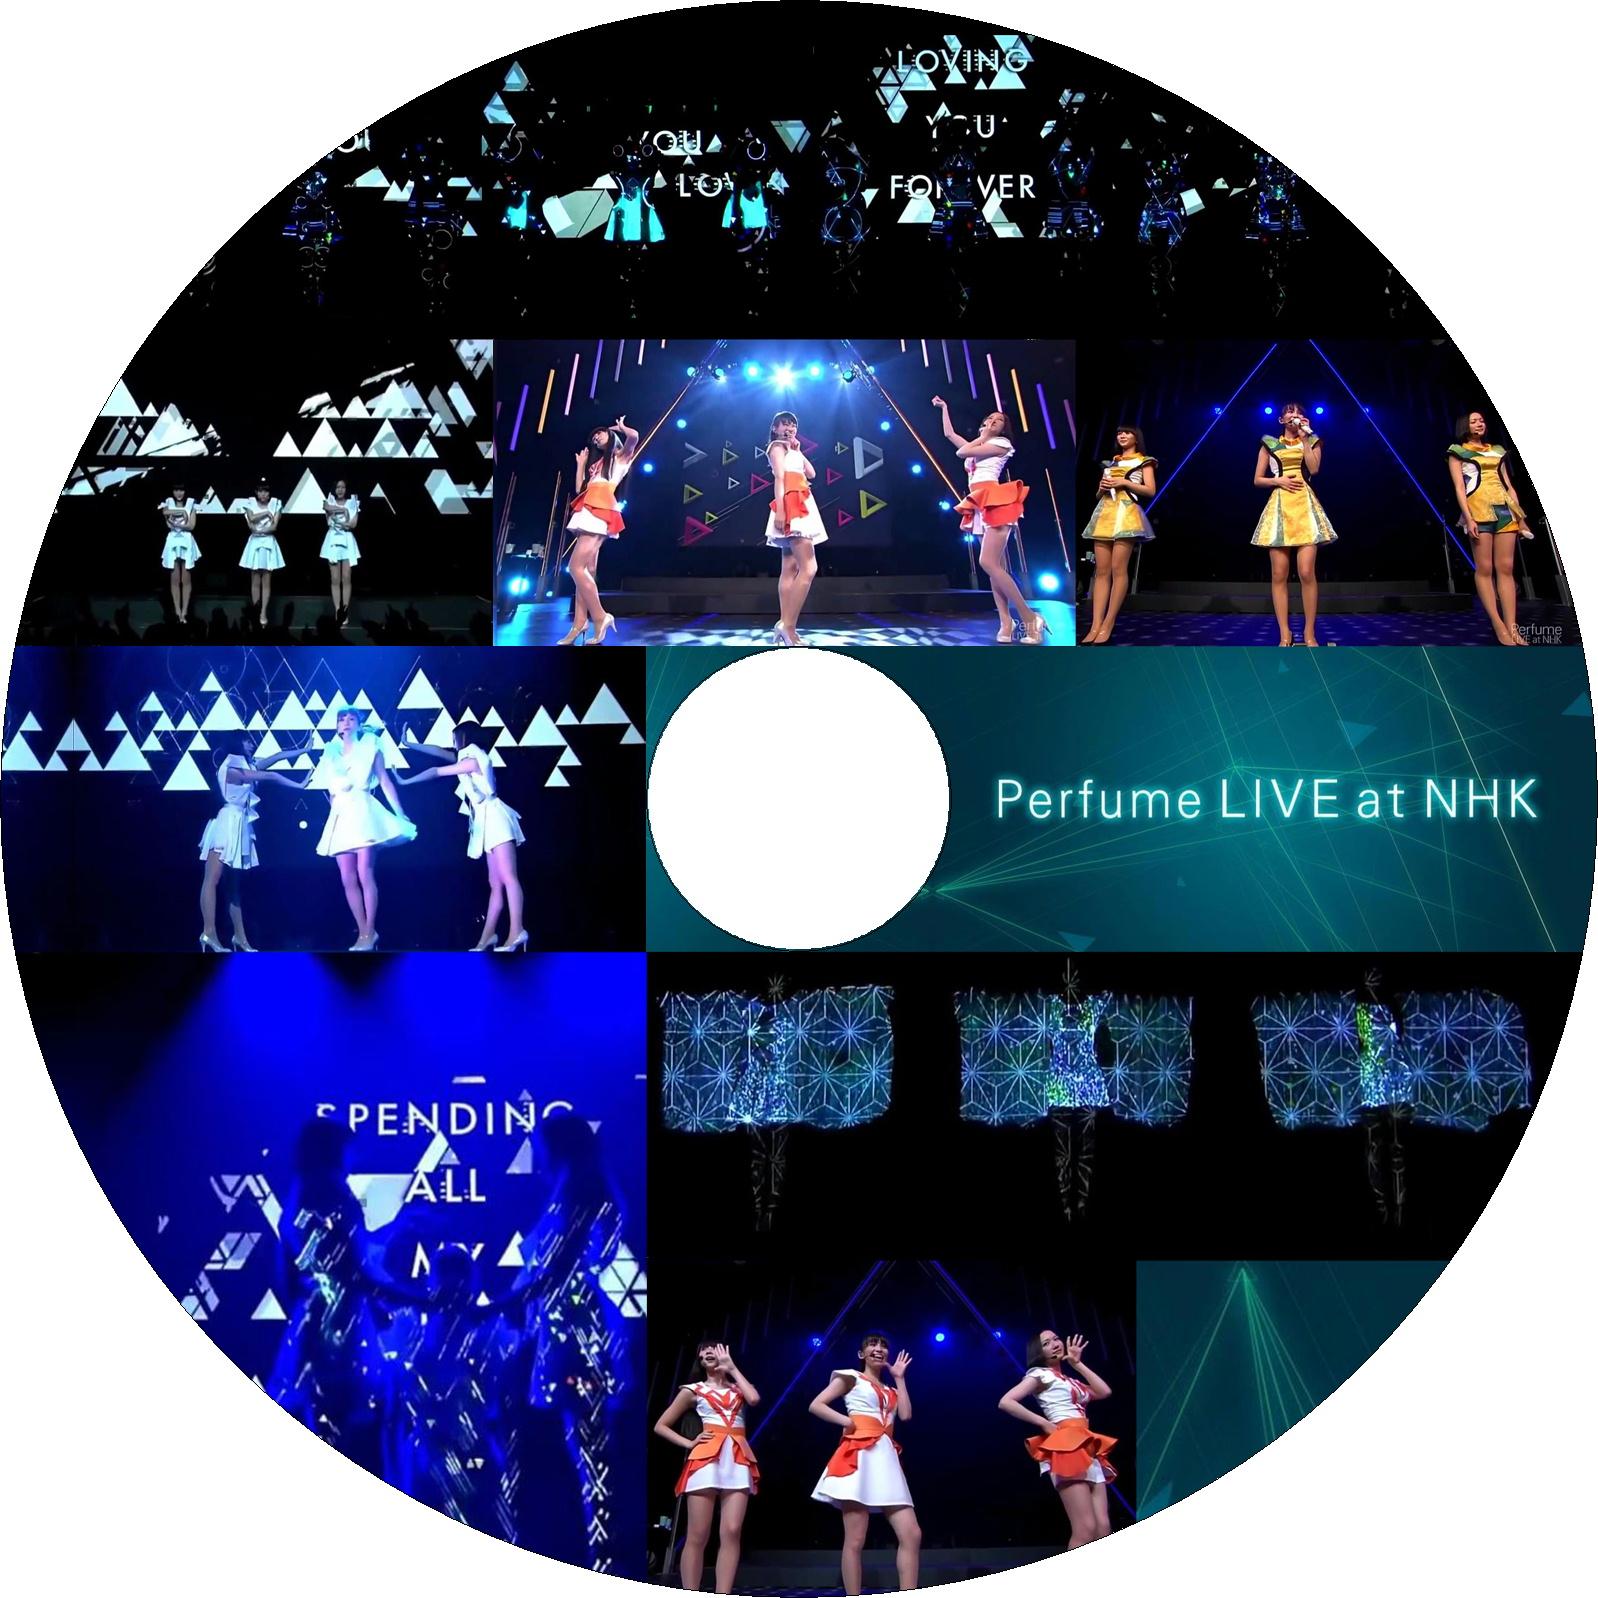 Perfume LIVE at NHK ラベル